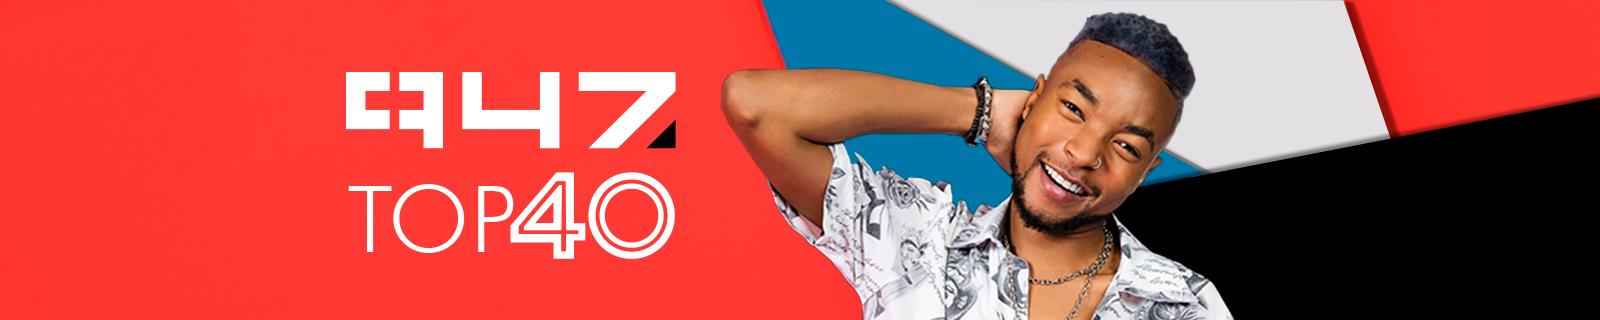 947-zweli-top-40-bannerjpg